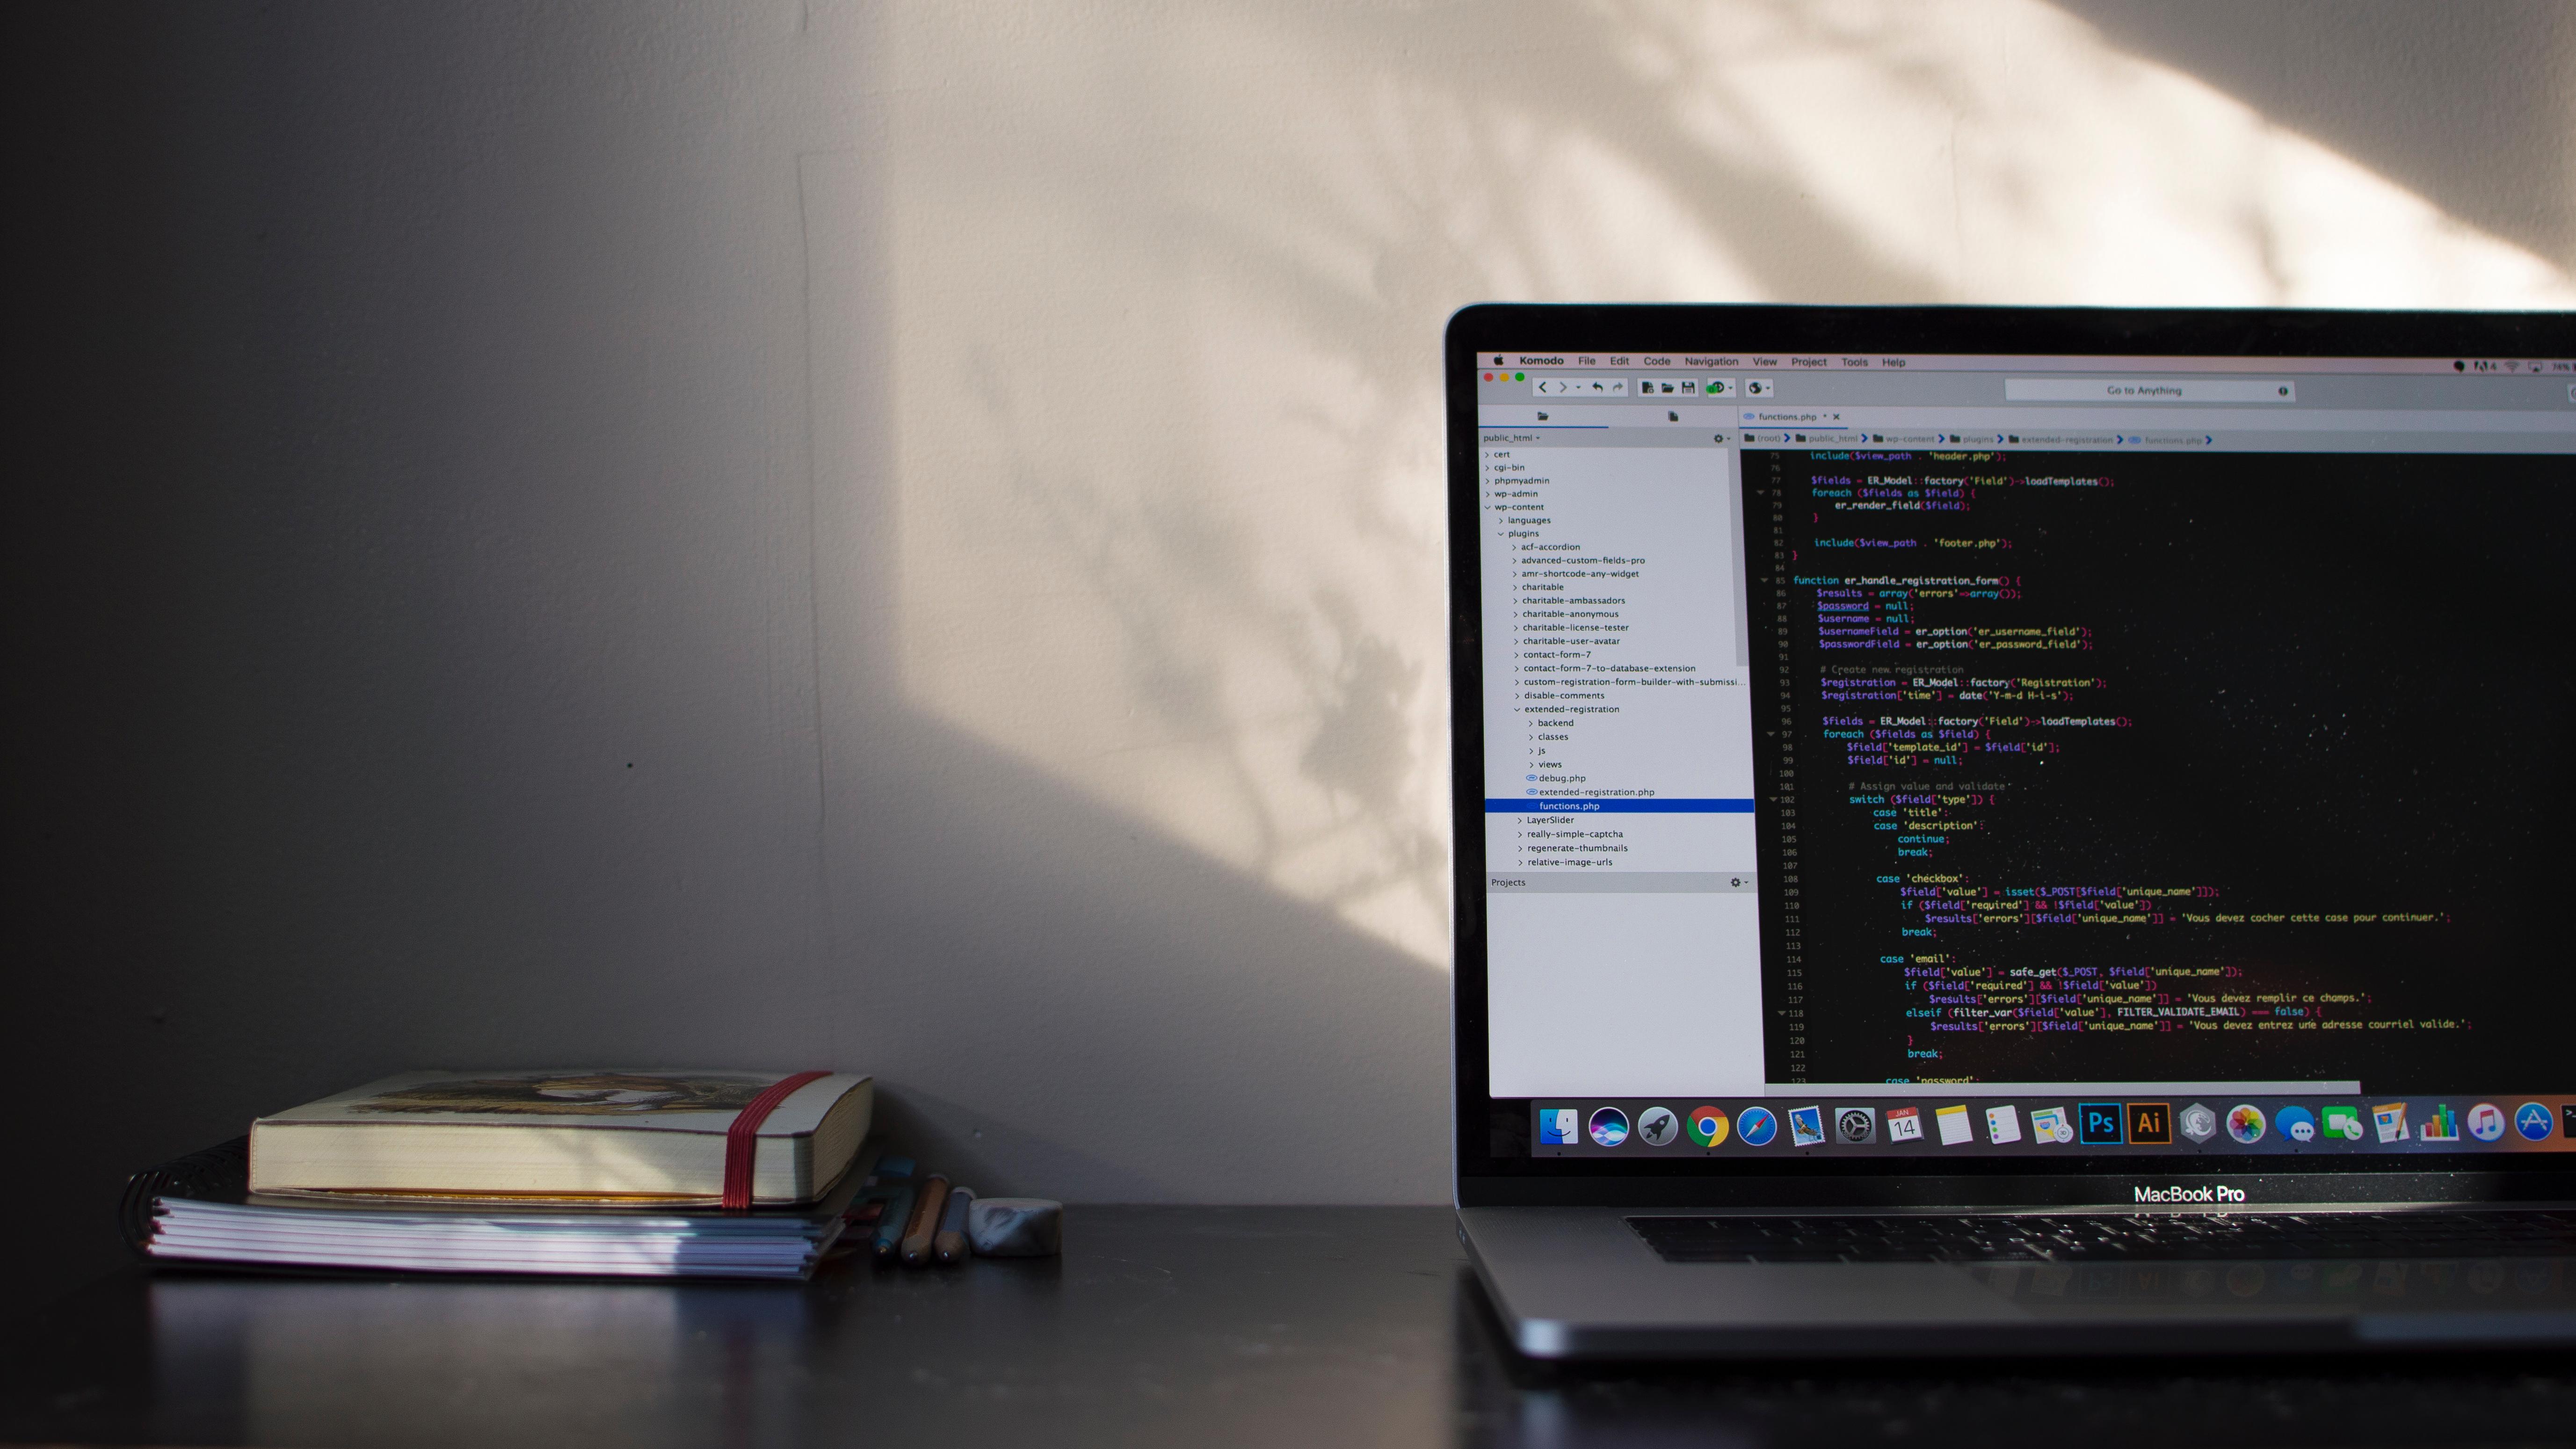 Tingkatan Keahlian Programmer